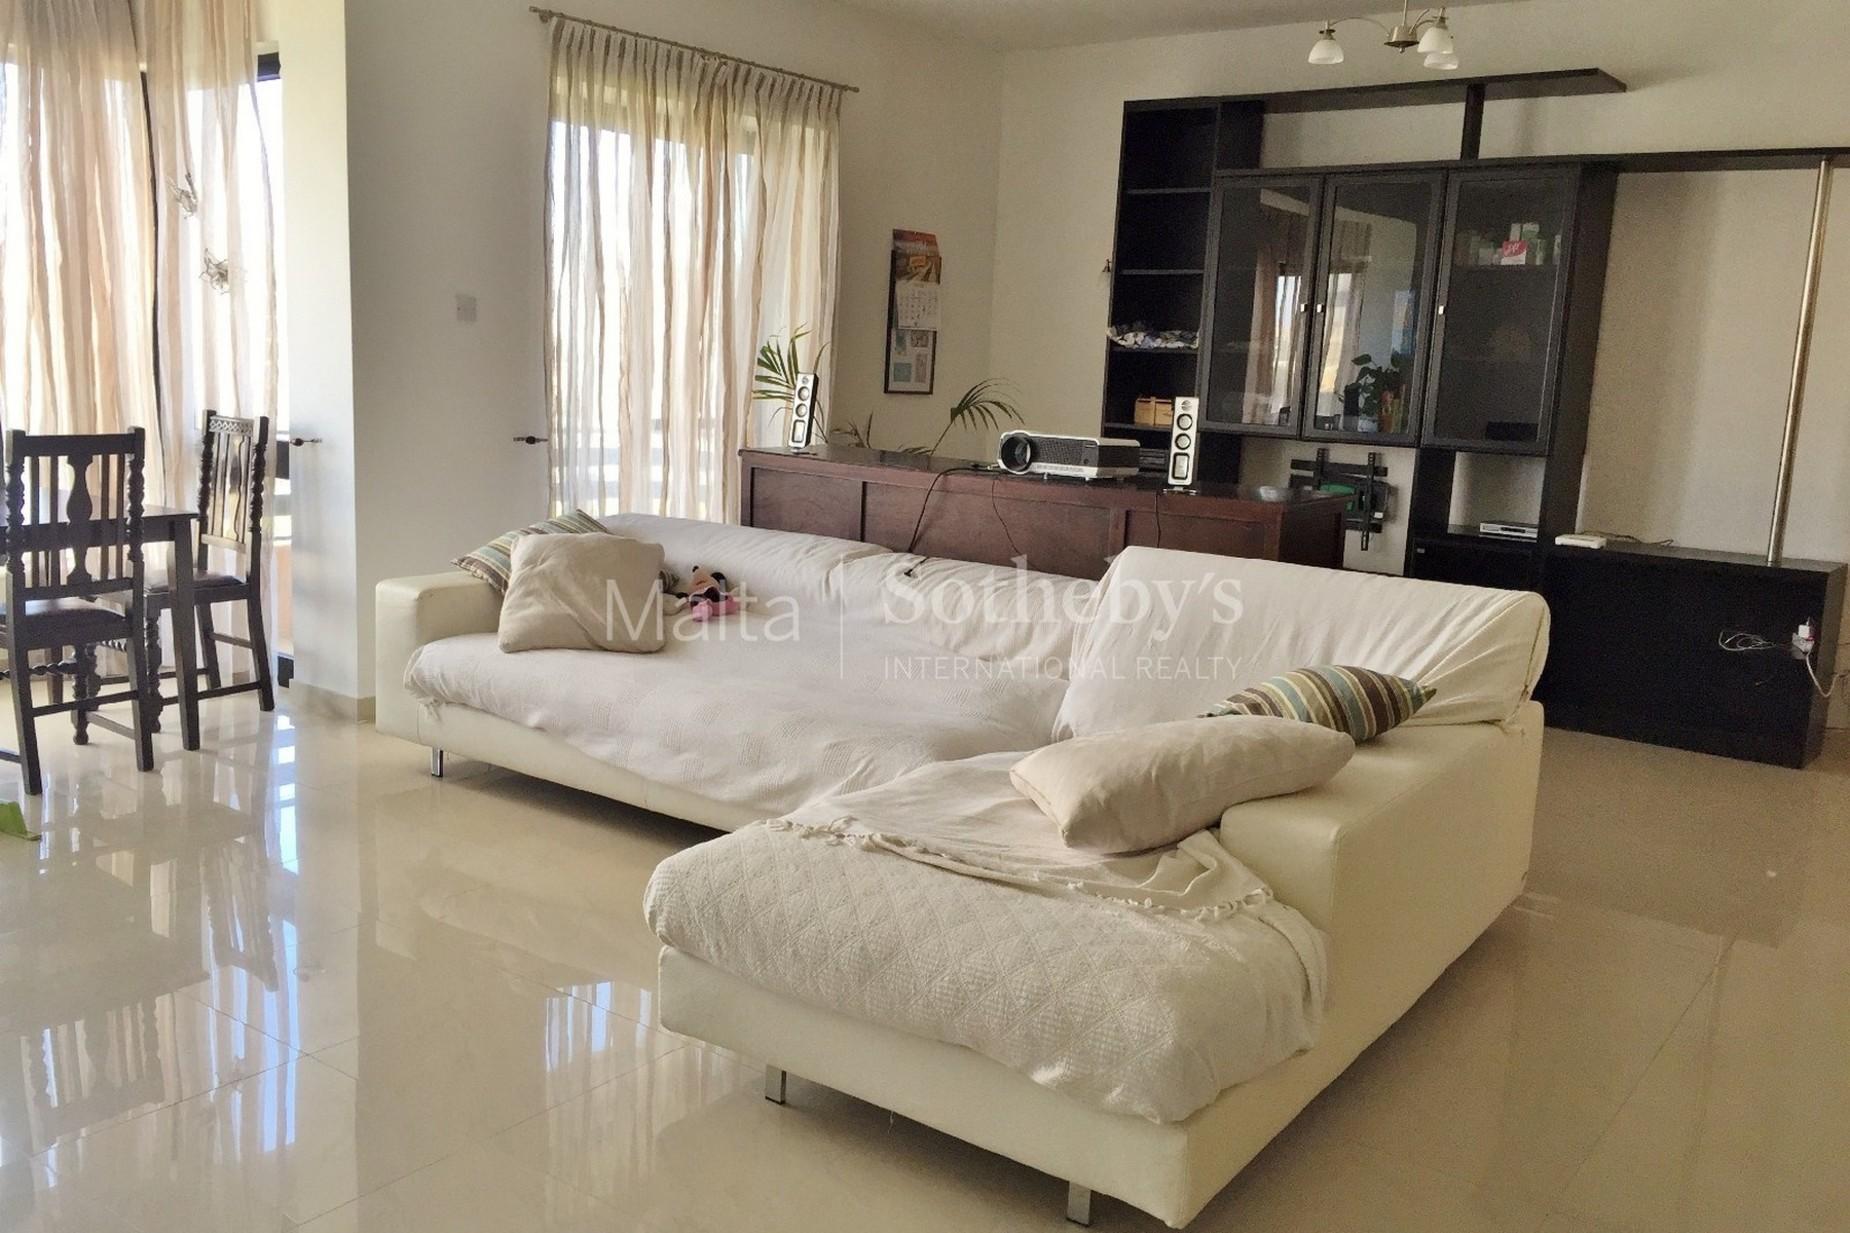 3 bed Apartment For Sale in Msida, Msida - thumb 7